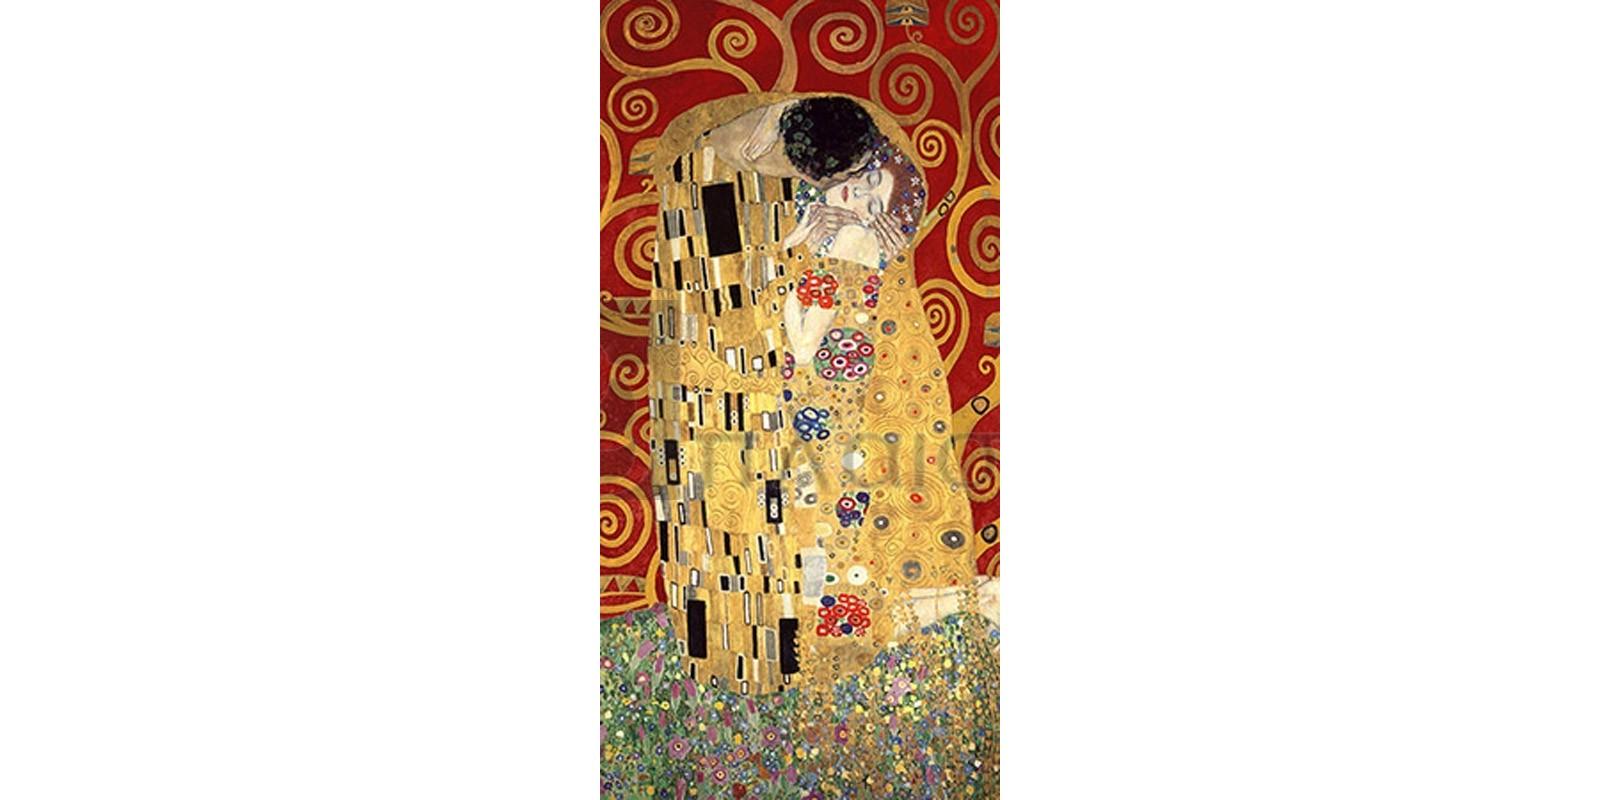 GUSTAV KLIMT - The Kiss (Red variation)